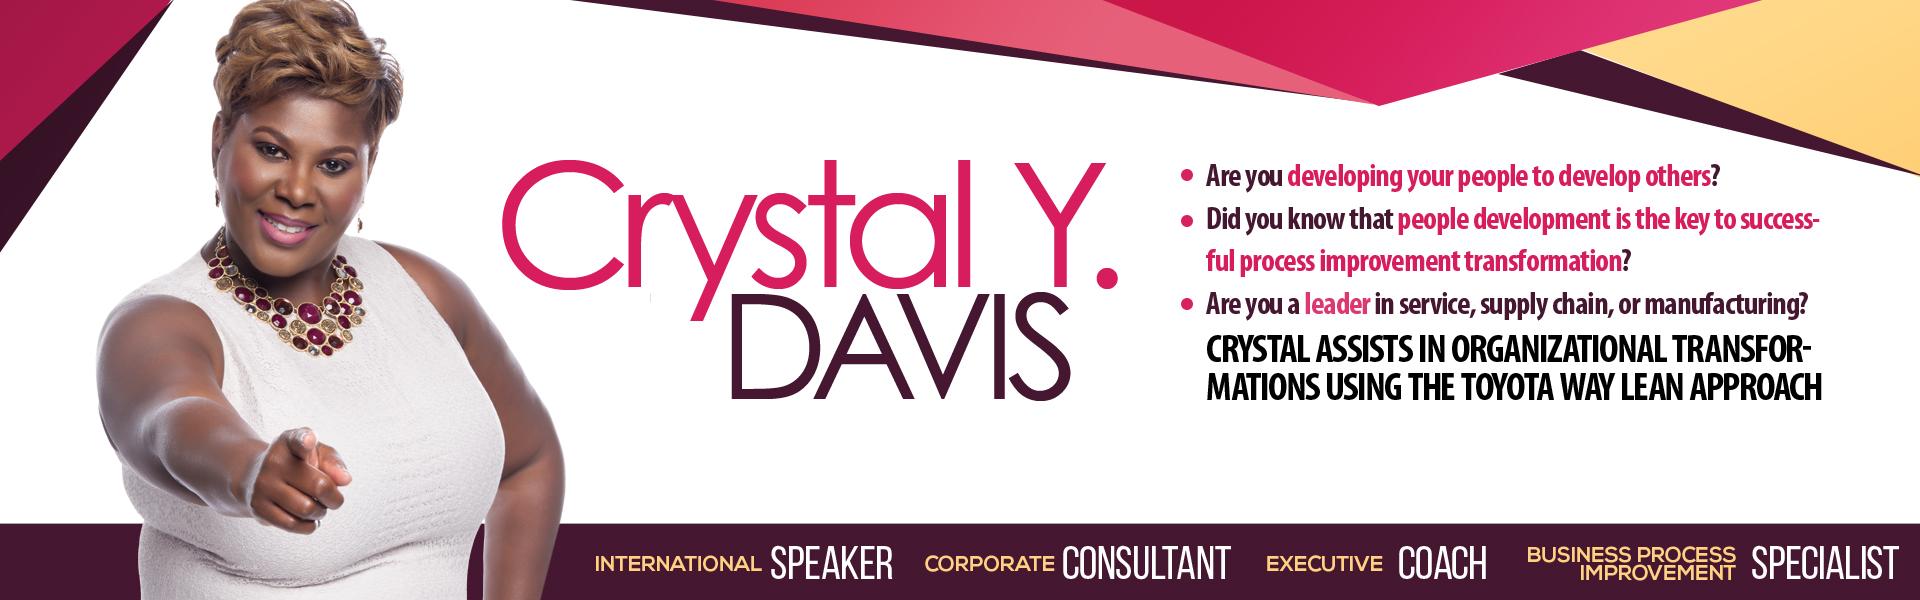 Crystal Y Davis Banner 1